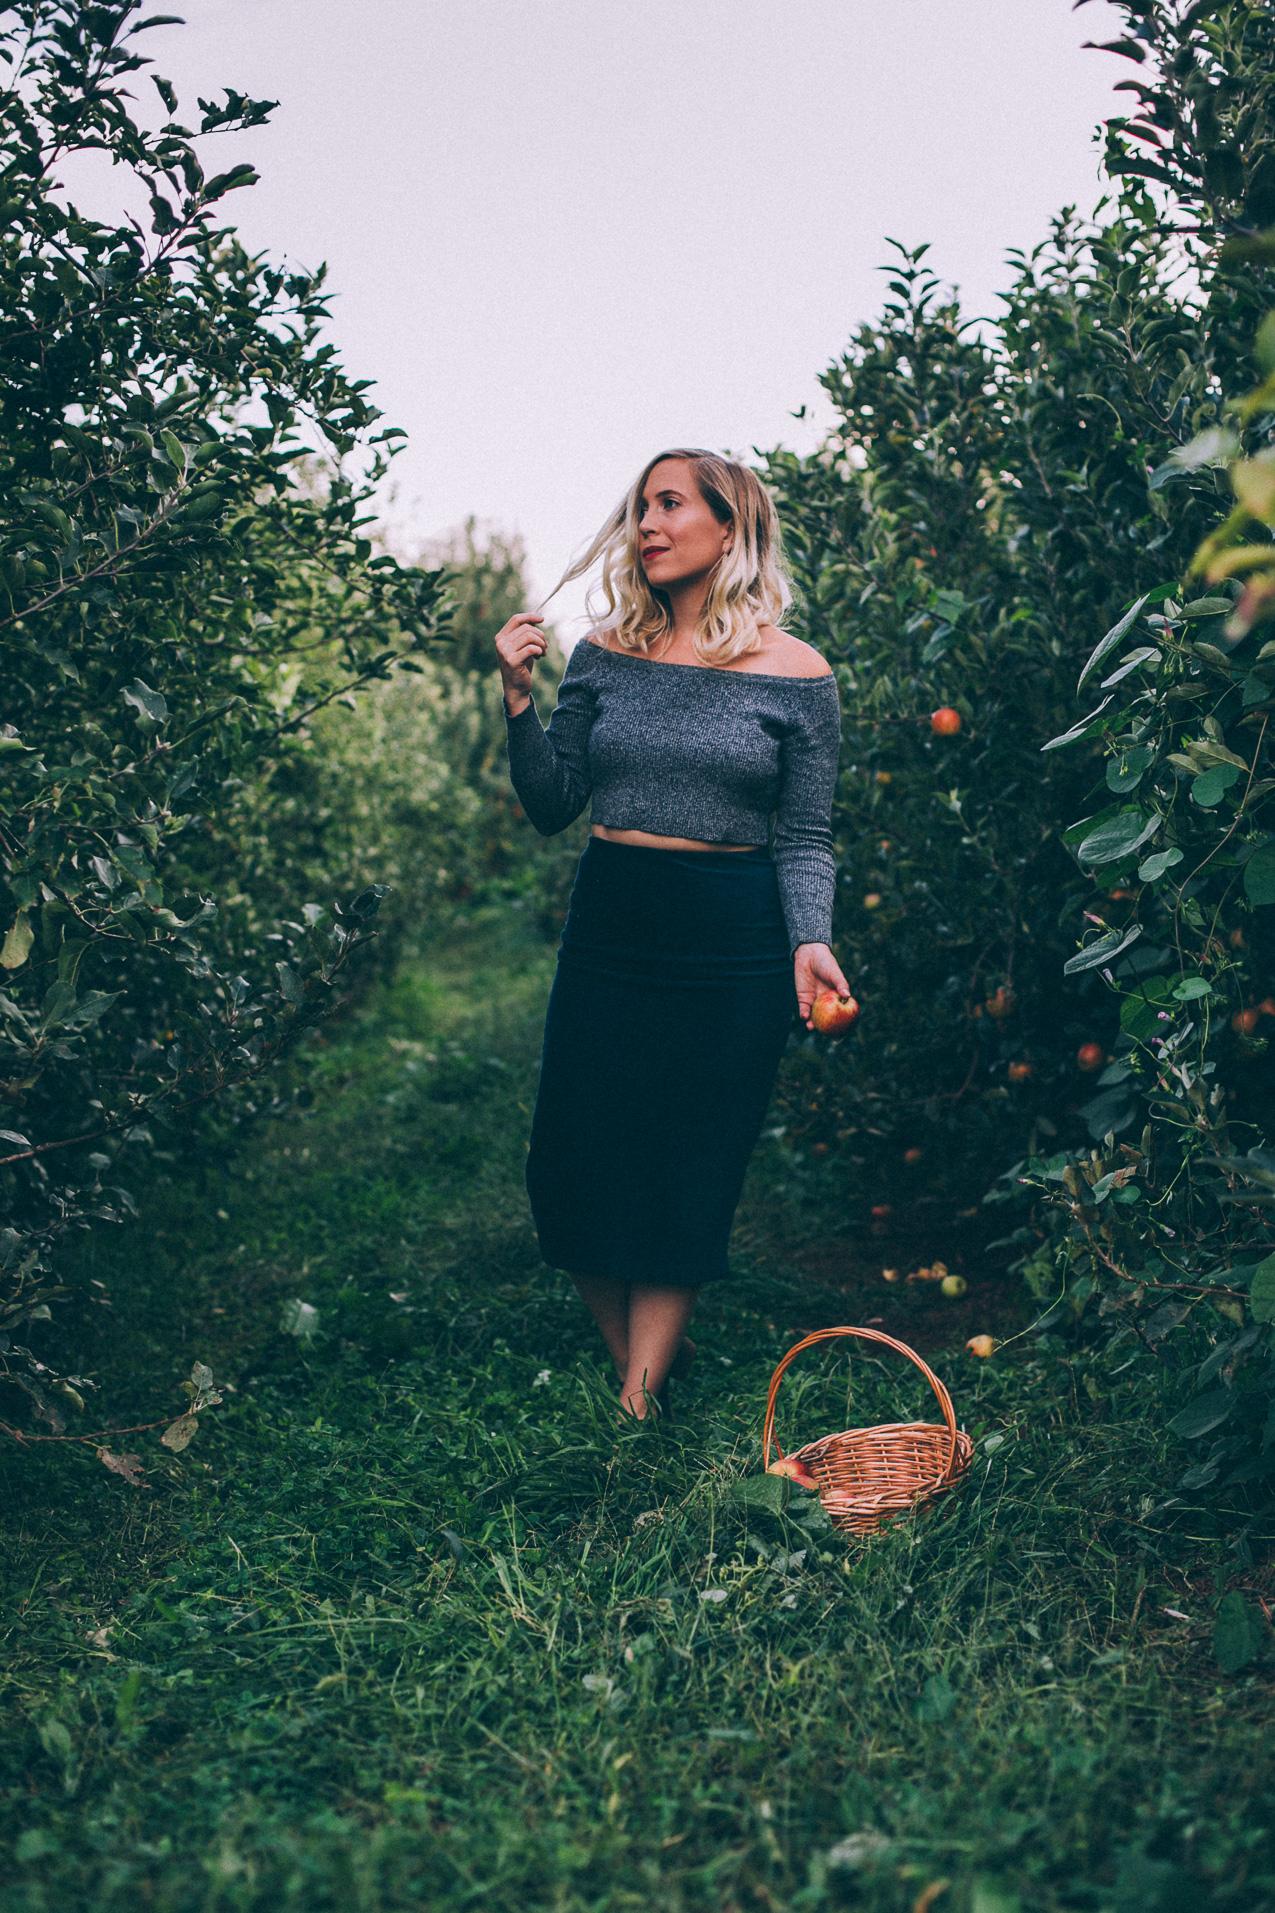 renee-byrd-portraits-carter-mountain-apple-orchard-october-4-2018-5678.jpg